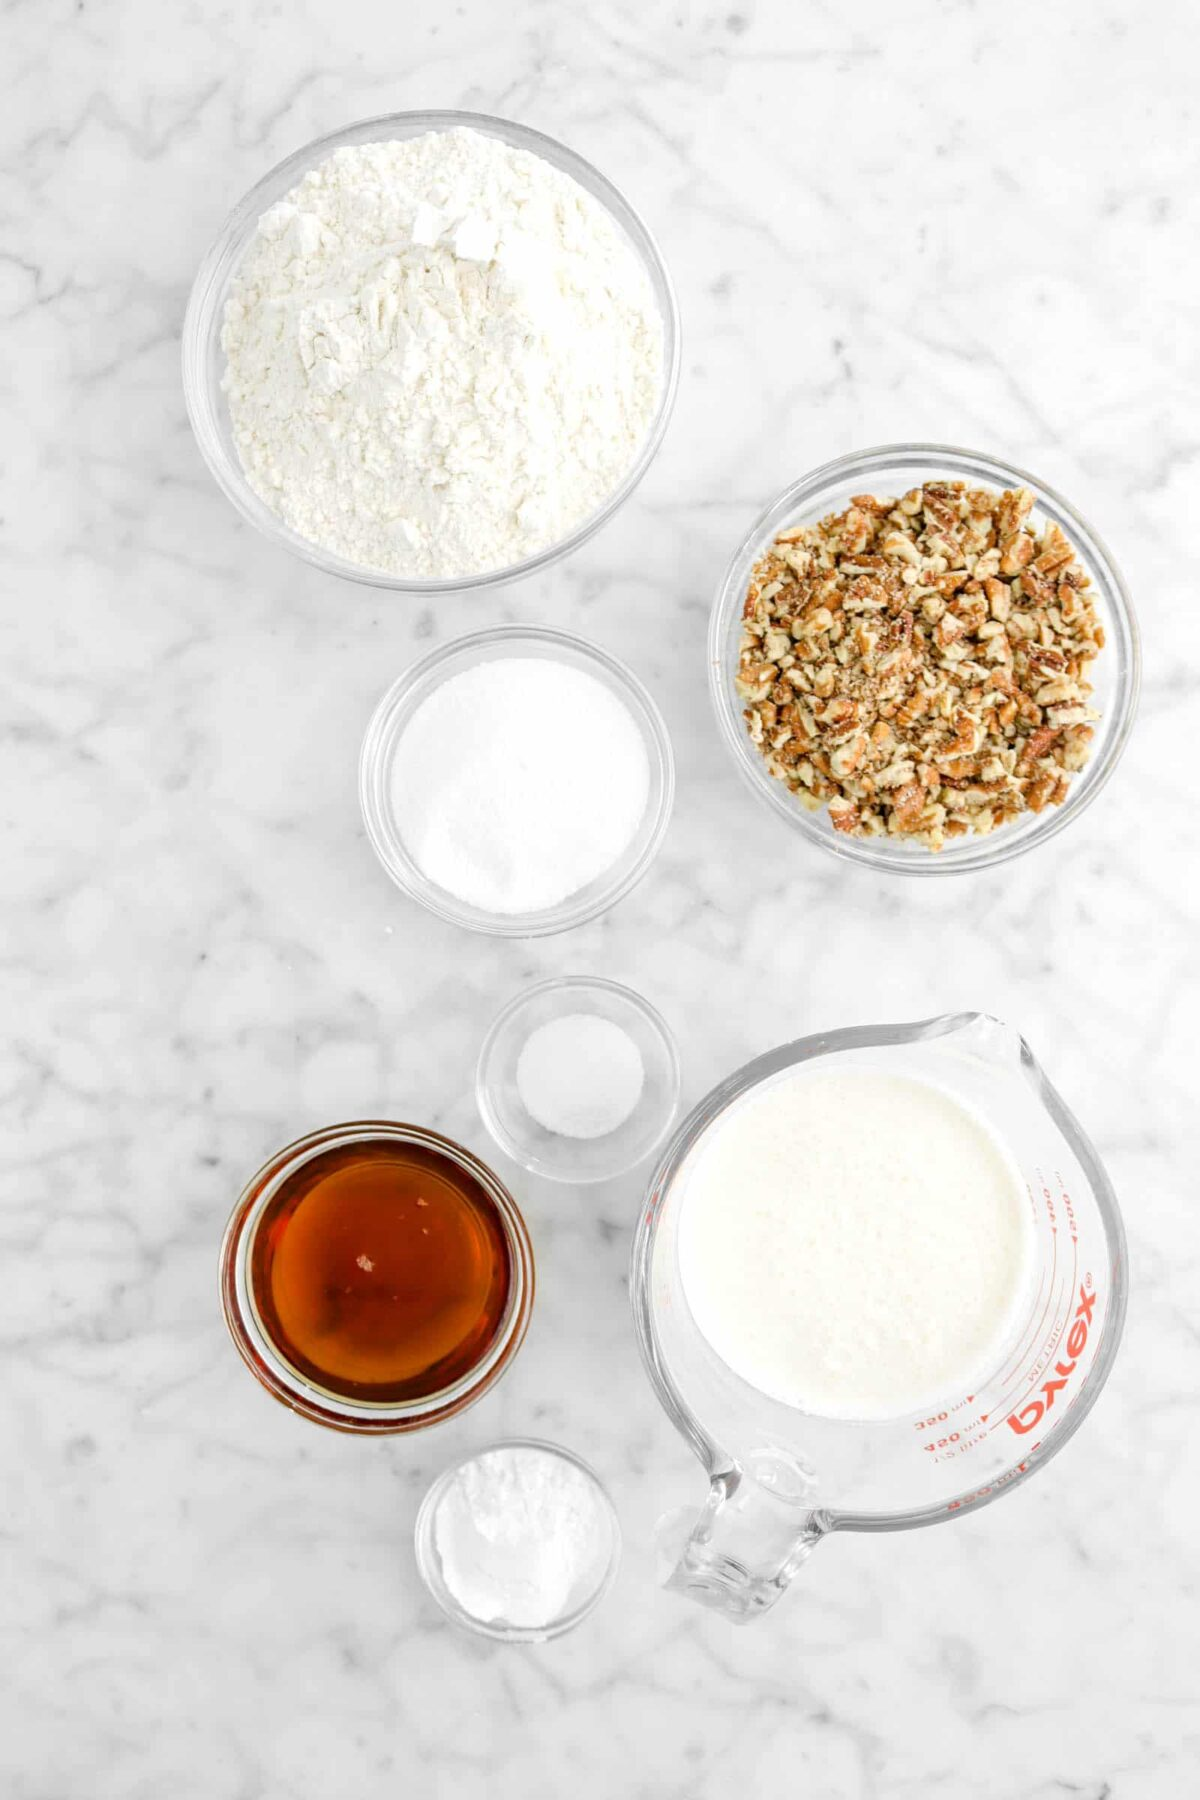 flour, chopped pecans, sugar, salt, maple syrup, milk, and baking powder in glass bowls